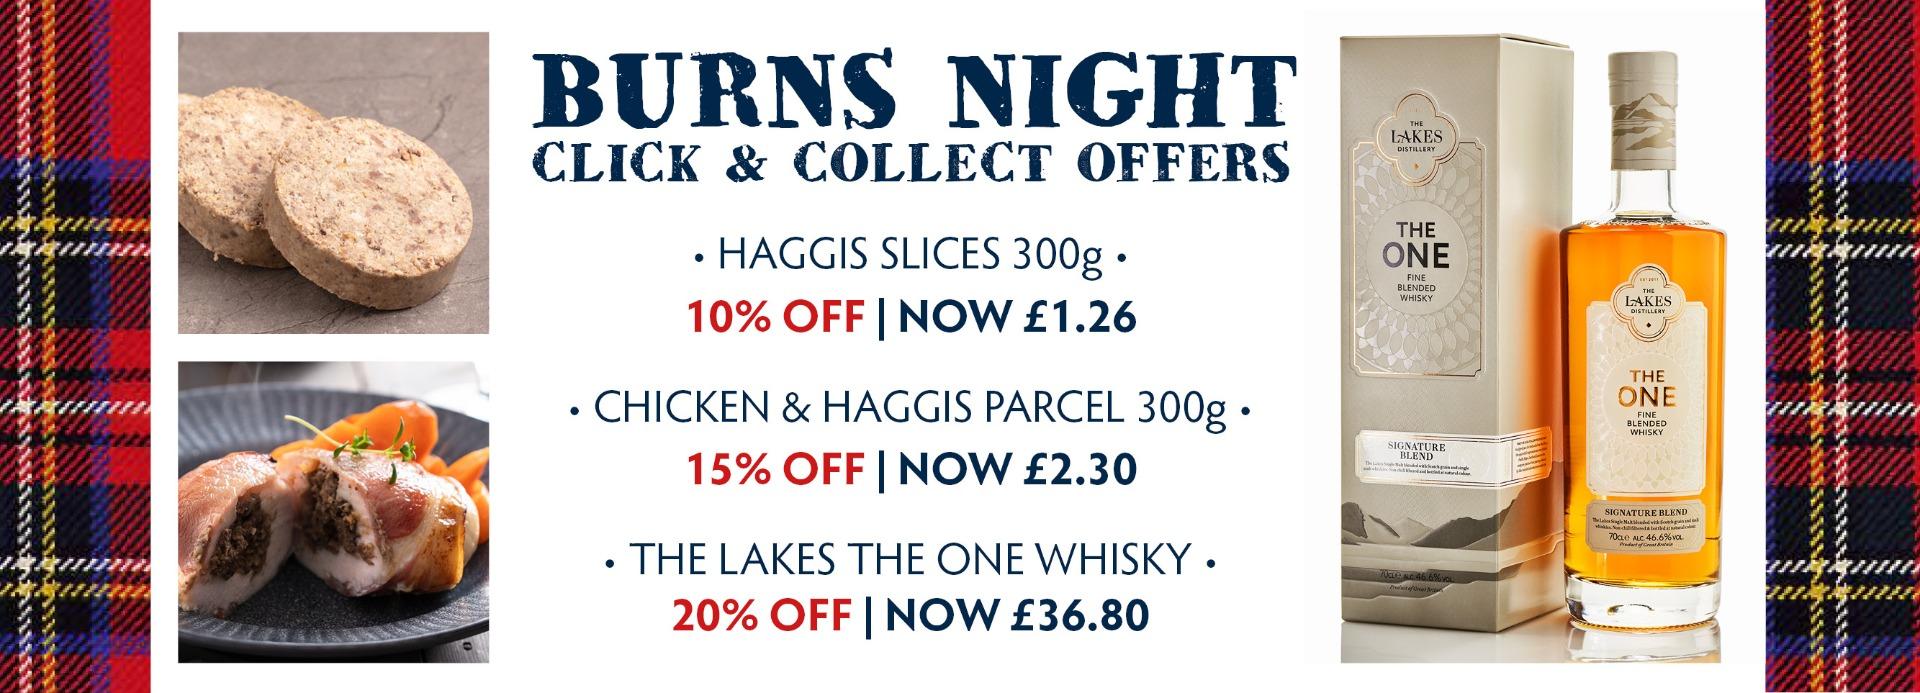 Burns Night Special Offer